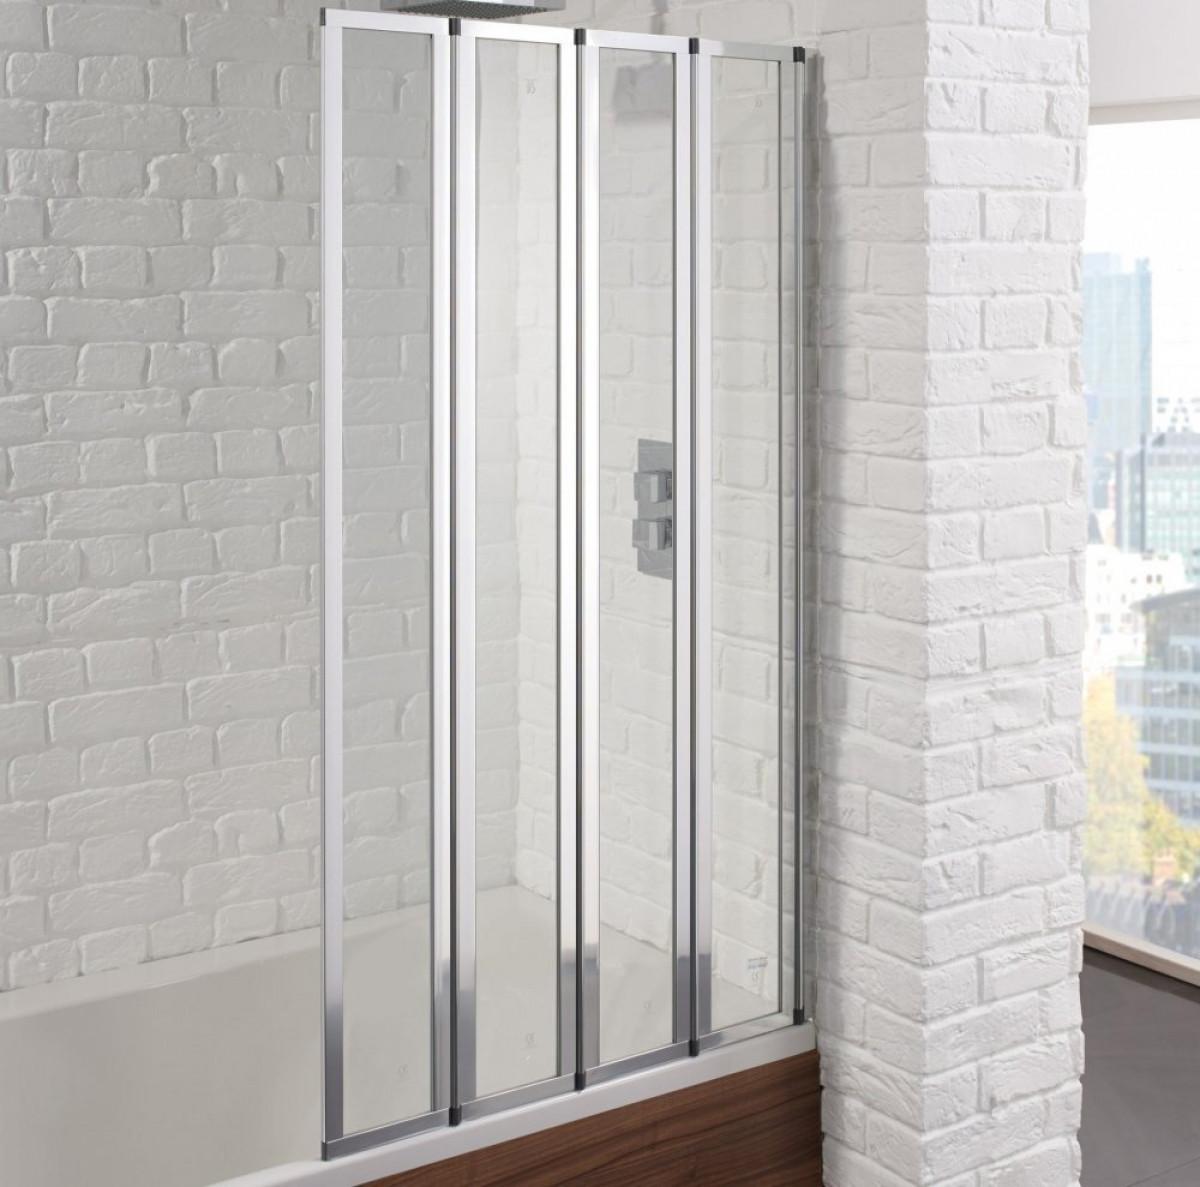 Shower Bath Screen Seal. 4 5 Fold Pivot Folding Bath Shower Screen ...